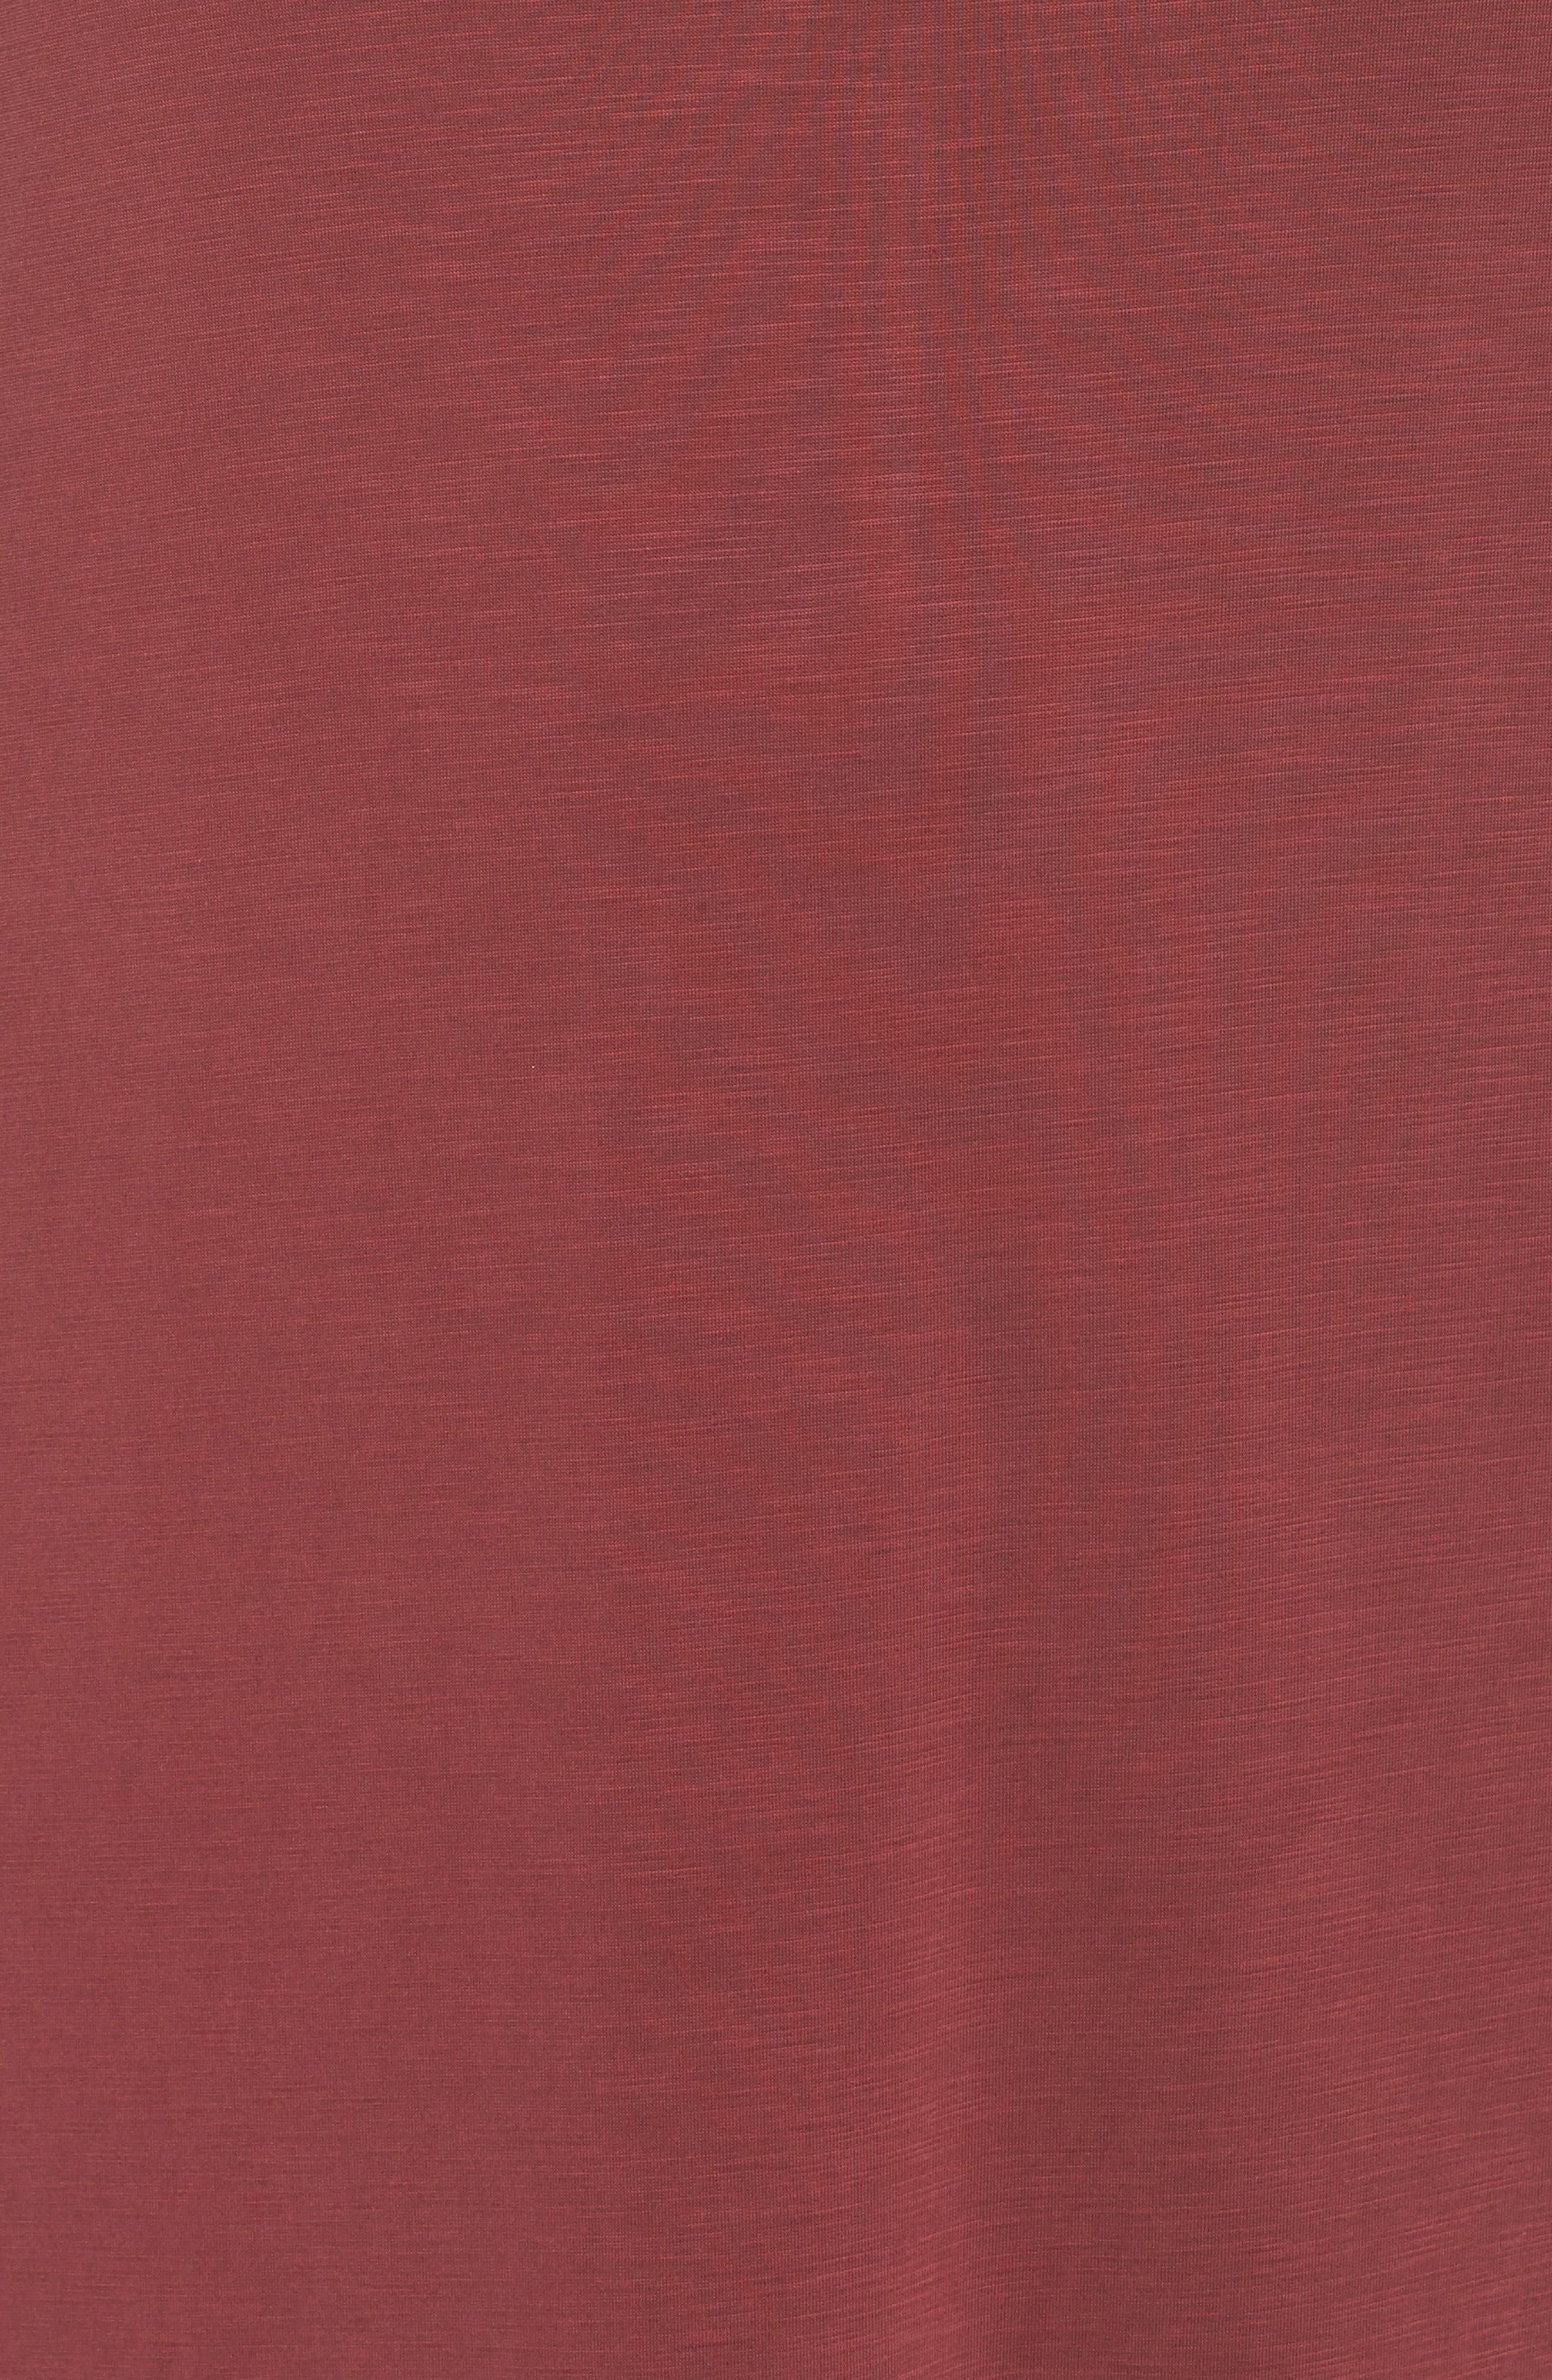 Boardwalk Jersey High/Low Dress,                             Alternate thumbnail 6, color,                             WASHED RAISIN